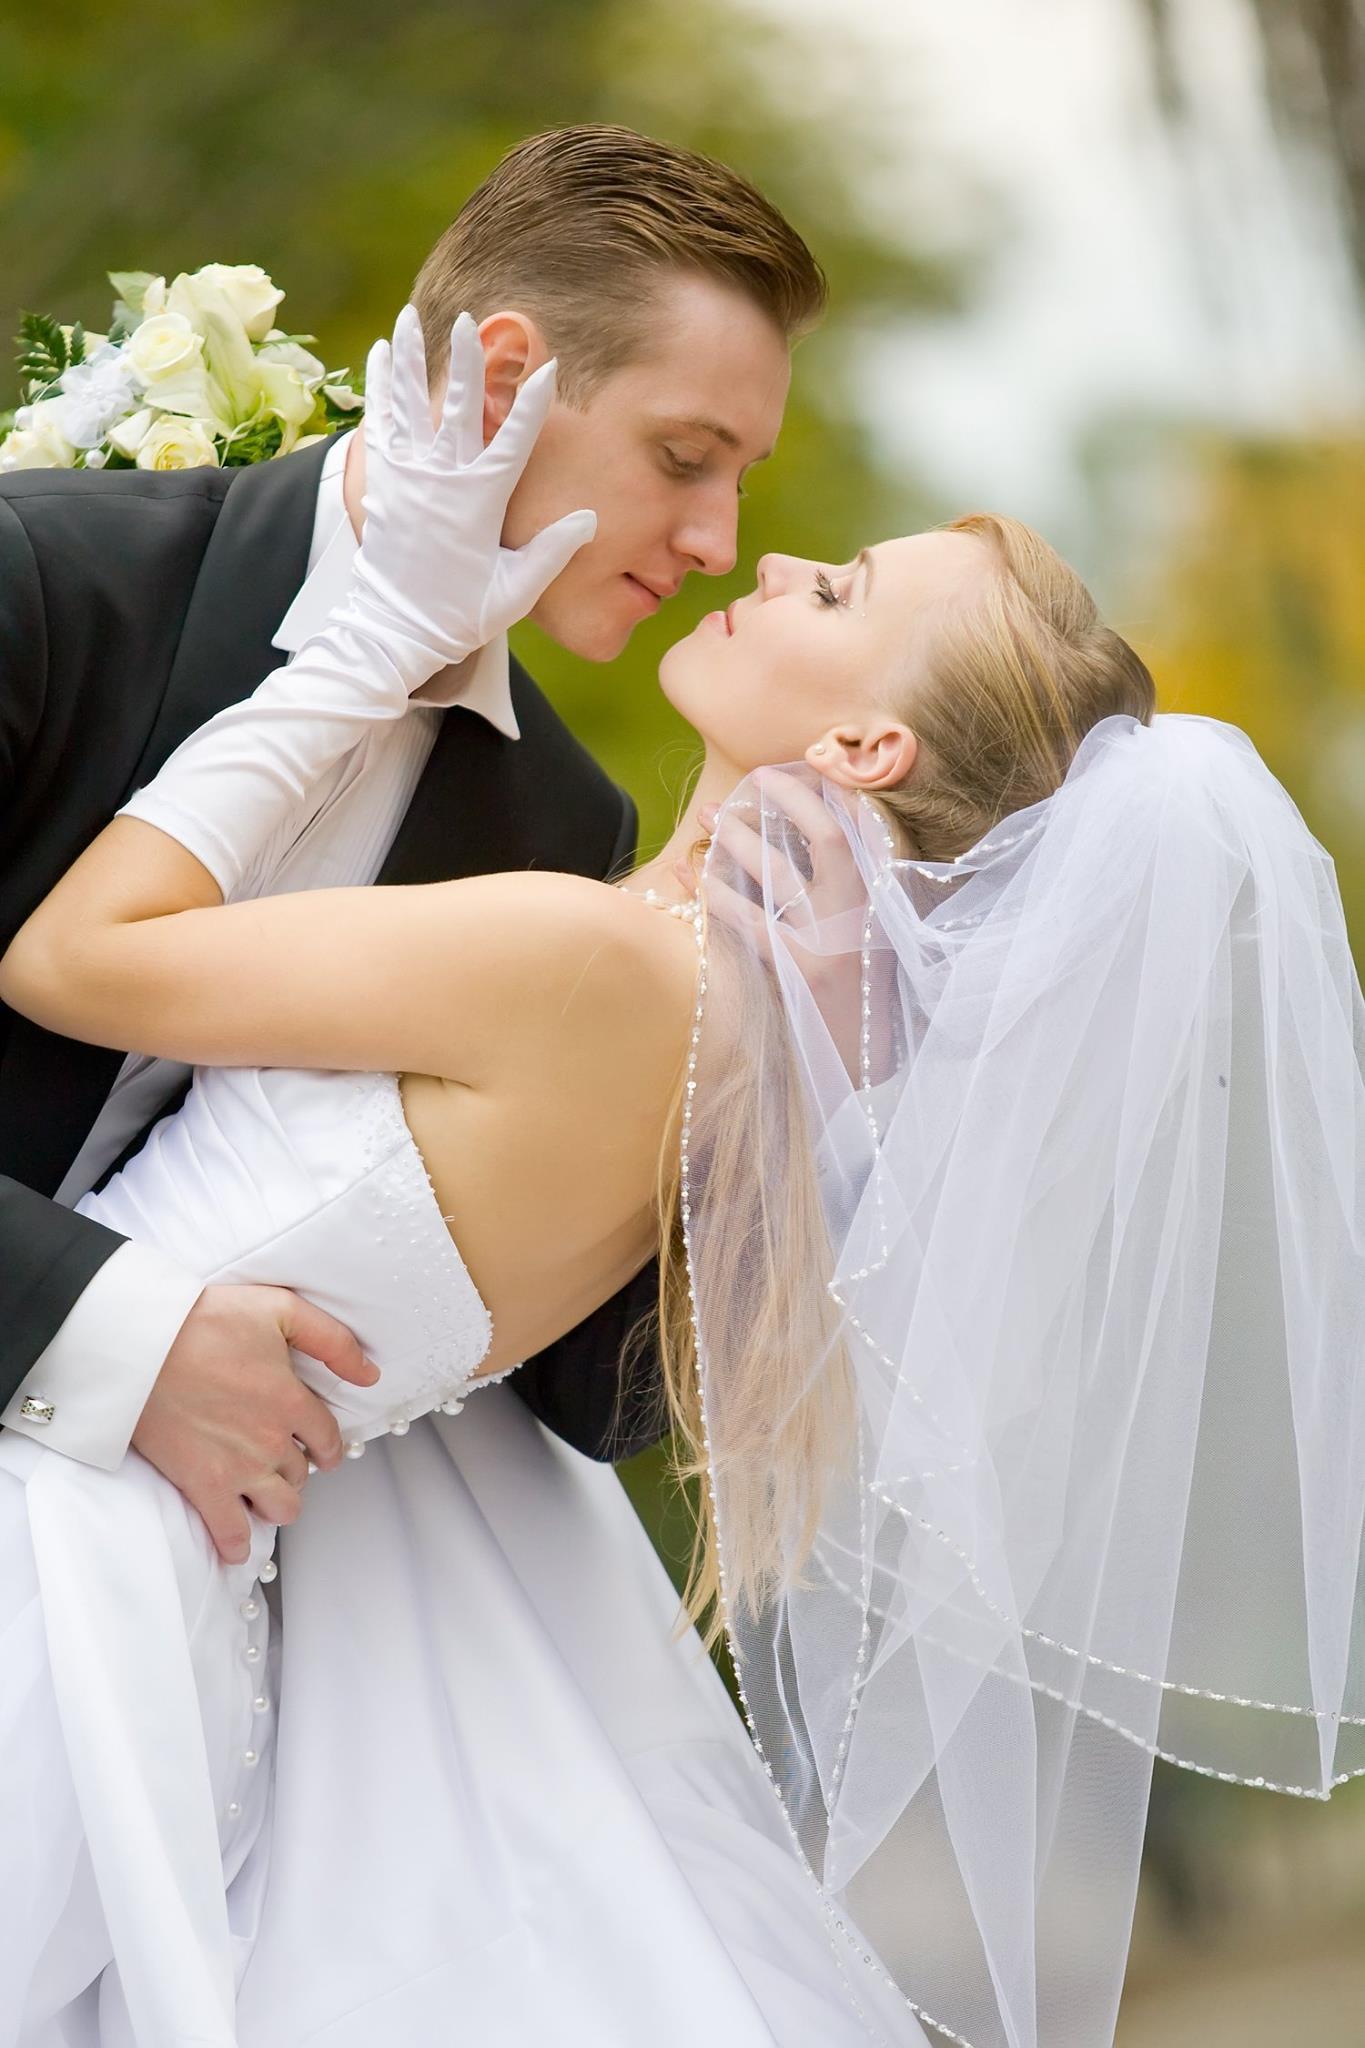 صور صور عريس وعروسه , احلى صور لعريس وعروسه جميله